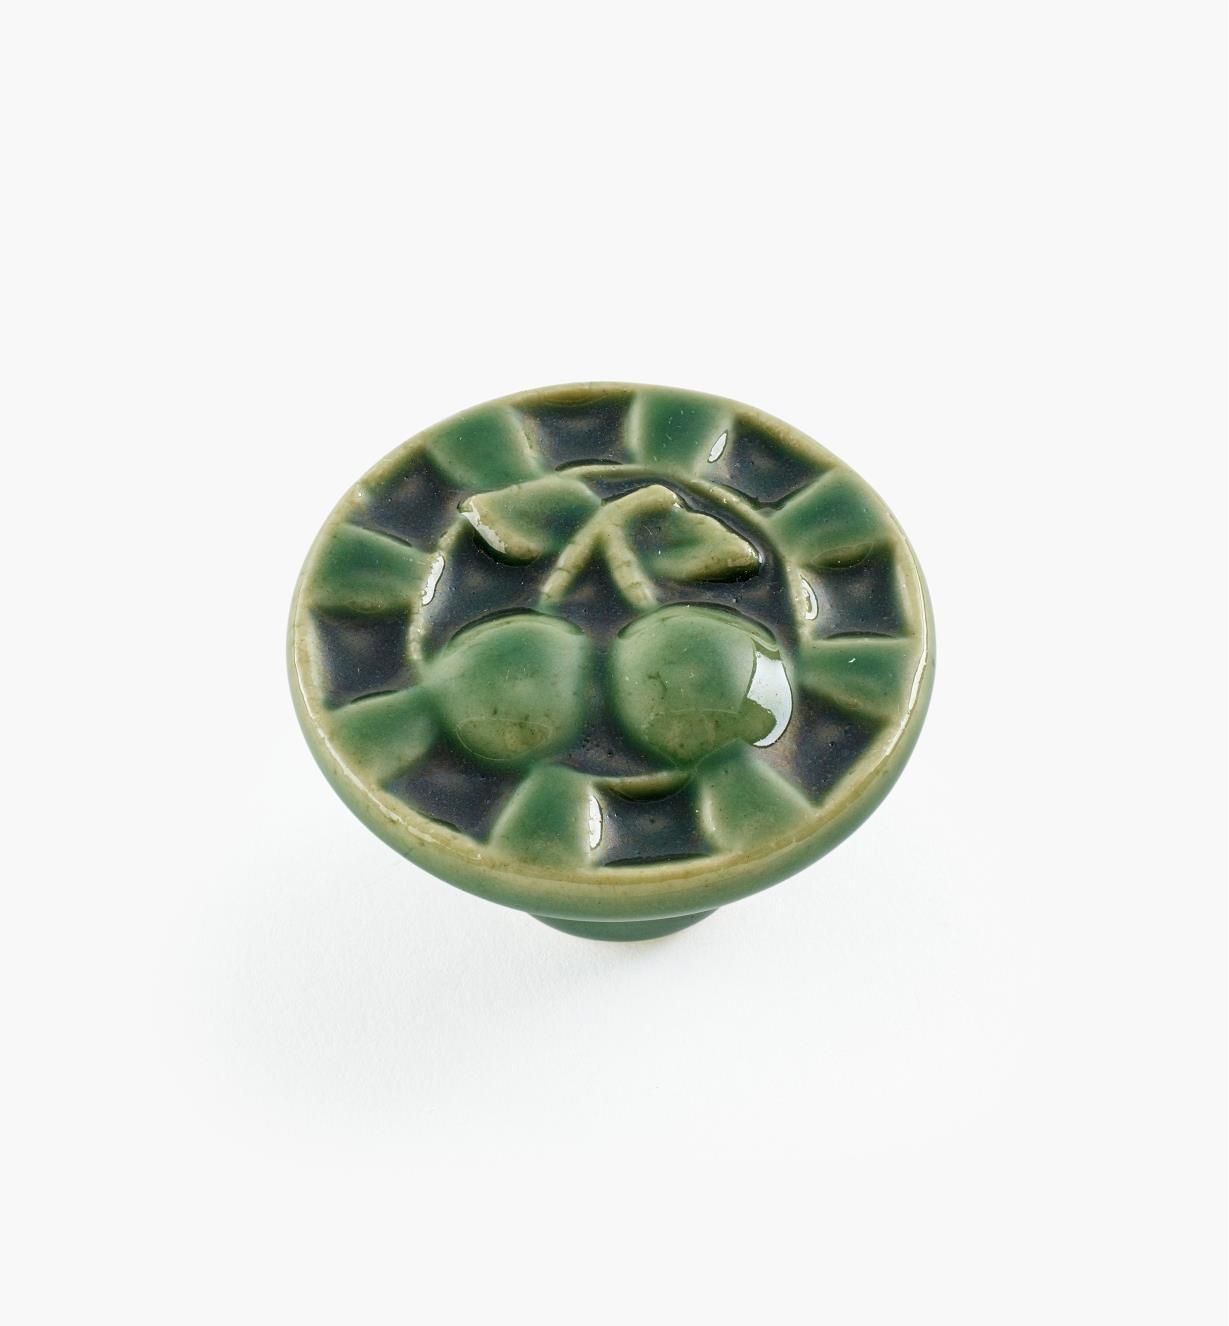 02W1631 - Bouton rond en céramique, vert, 1 1/2 po x 1 po